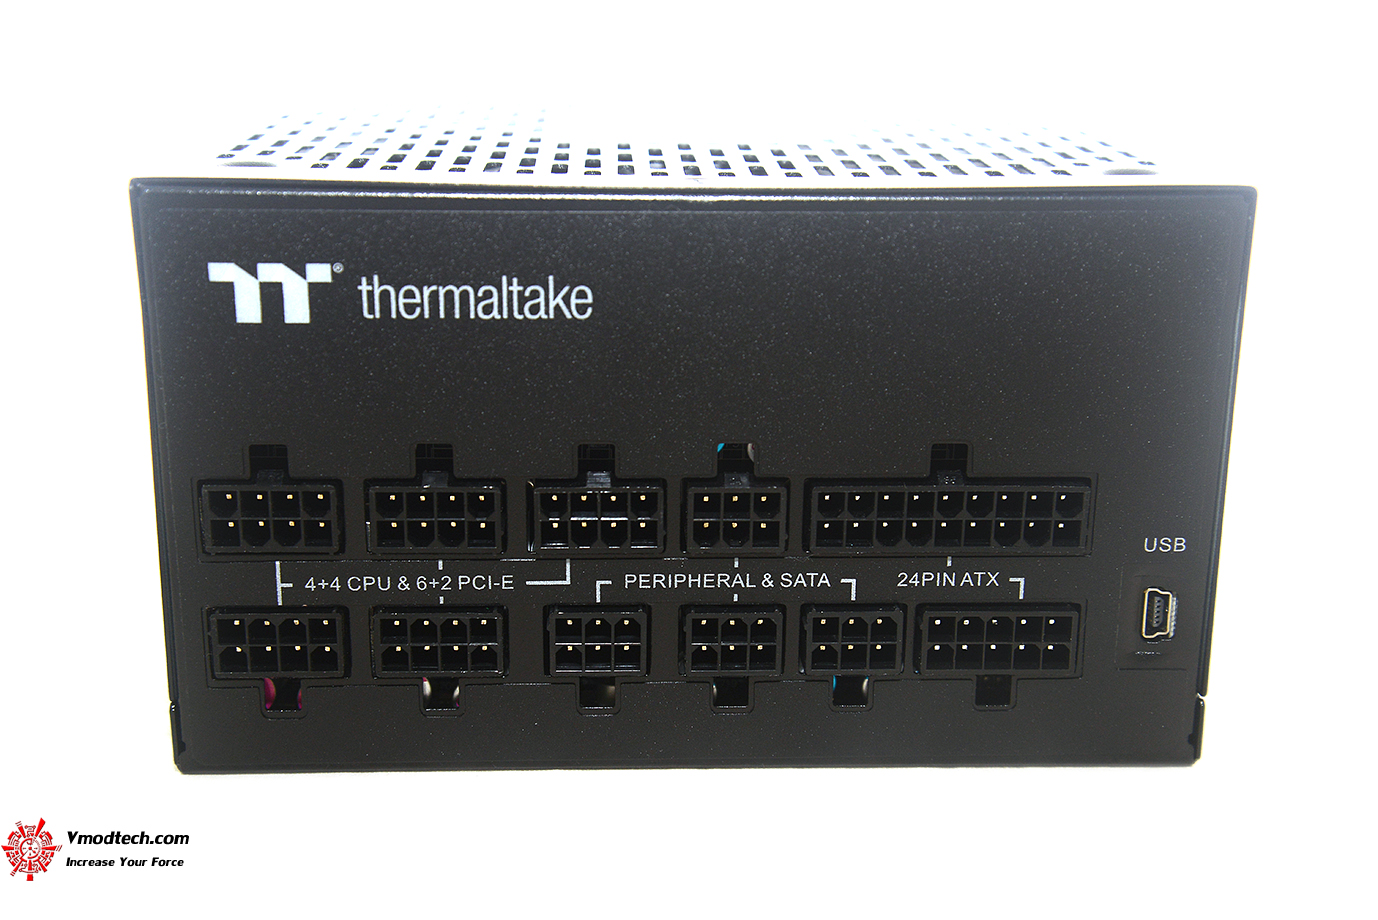 dsc 1477 Thermaltake Toughpower iRGB PLUS 1050W Platinum Review